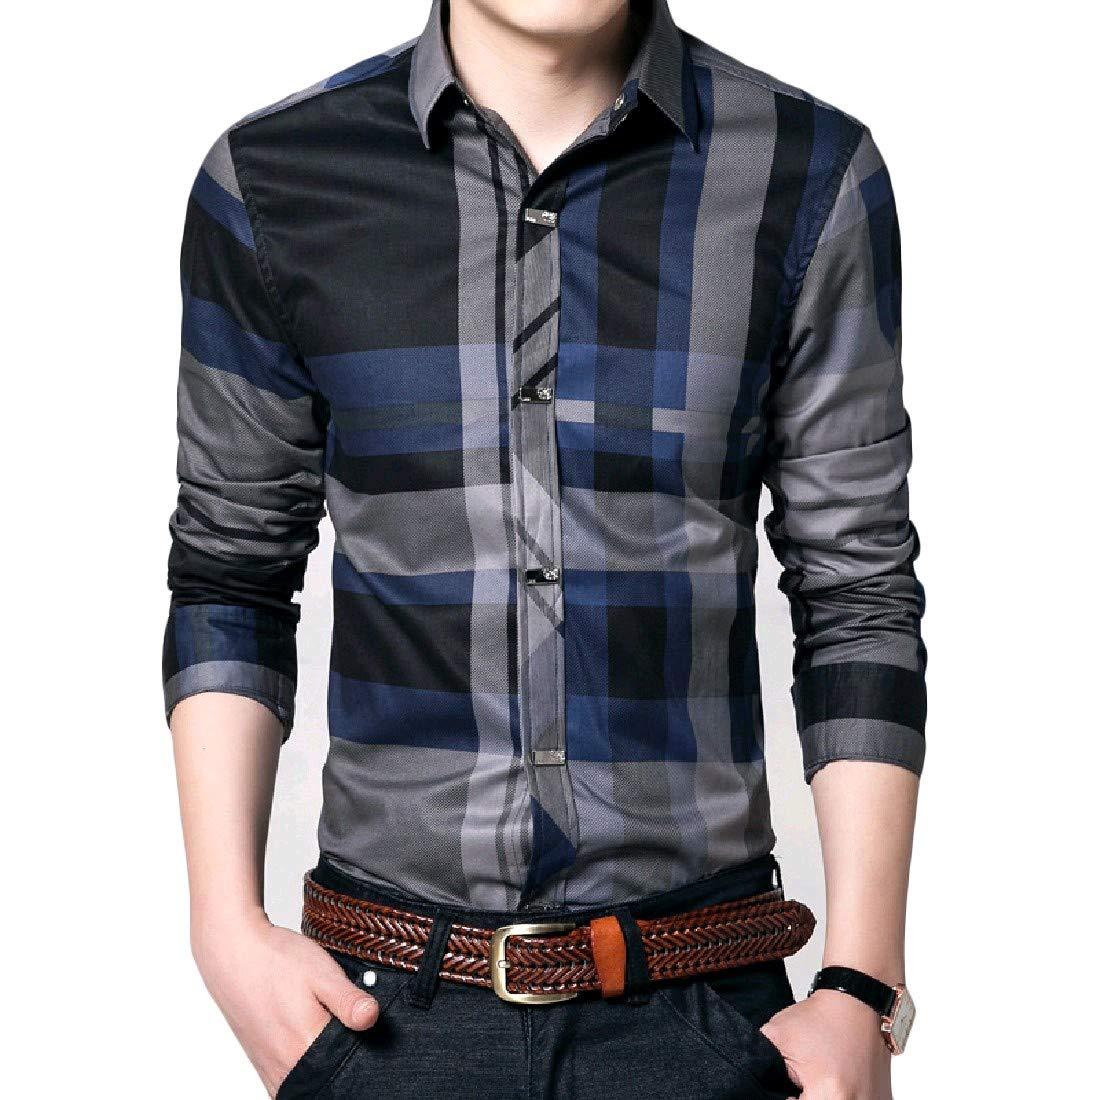 VITryst-Men Classics Plaid Plus Size Business Lounge Polo Shirt